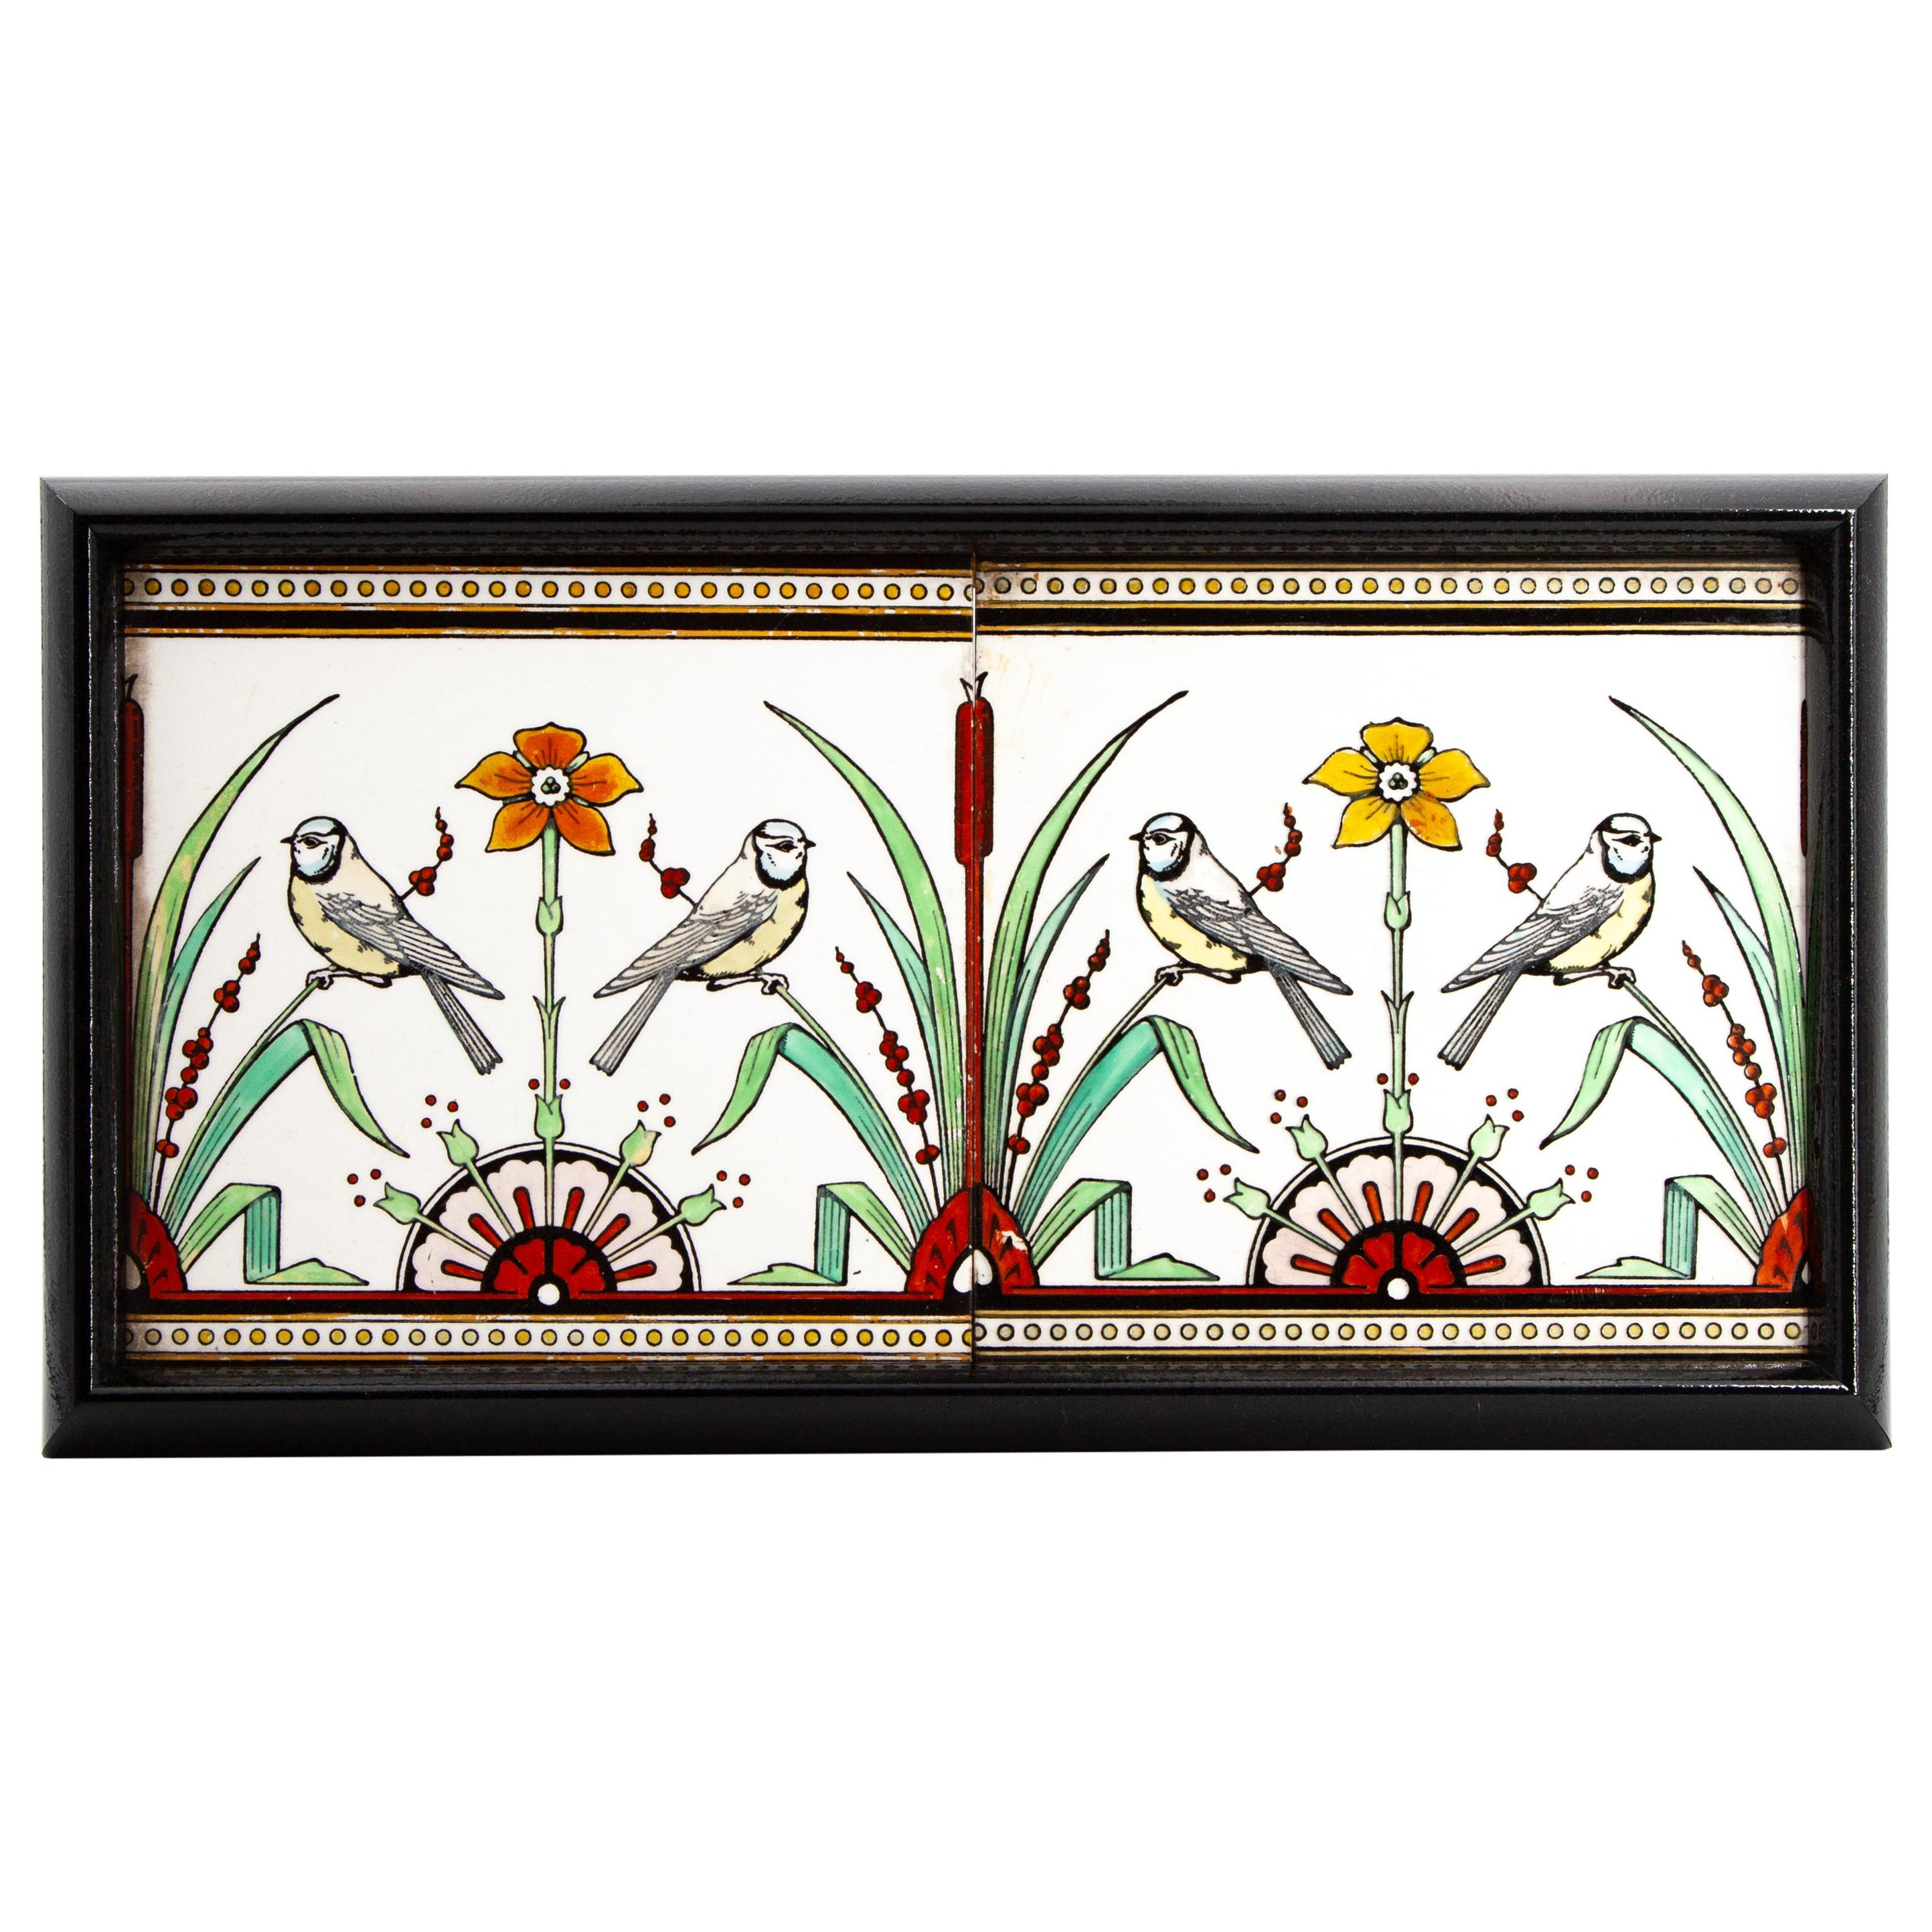 Pair of Minton Bird Tiles Designed by Christopher Dresser, circa 1875